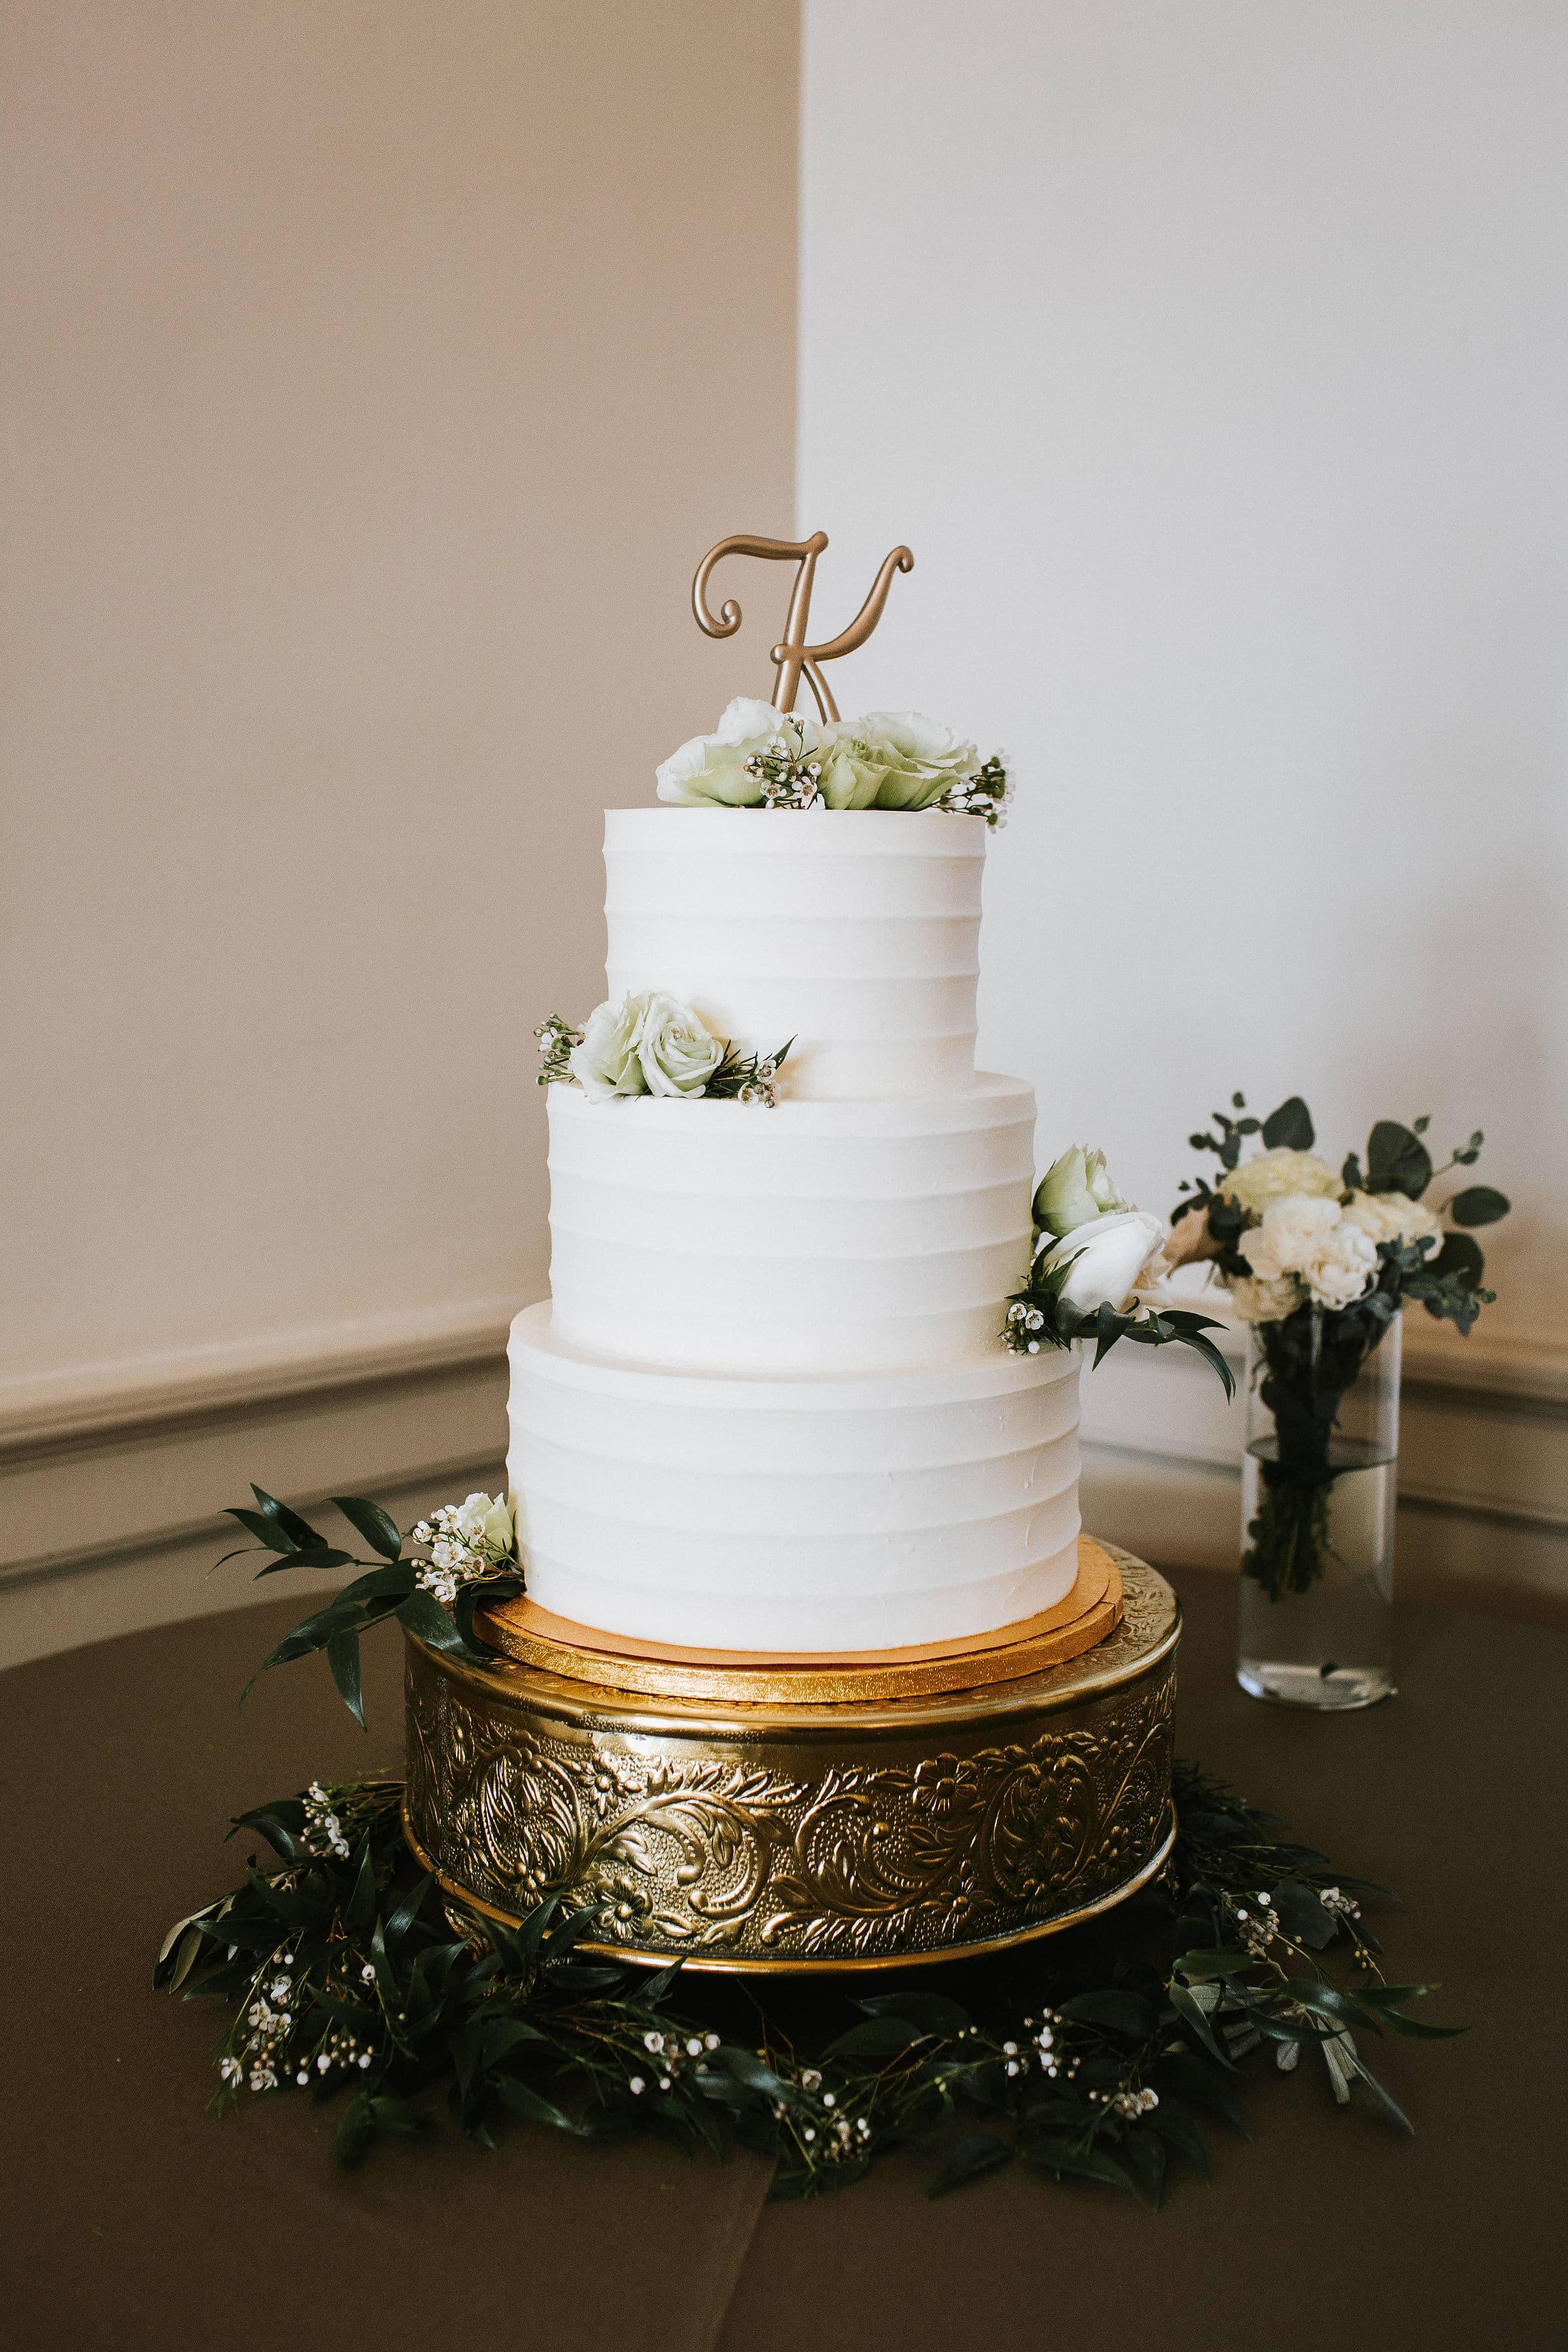 cake with greenery .jpg